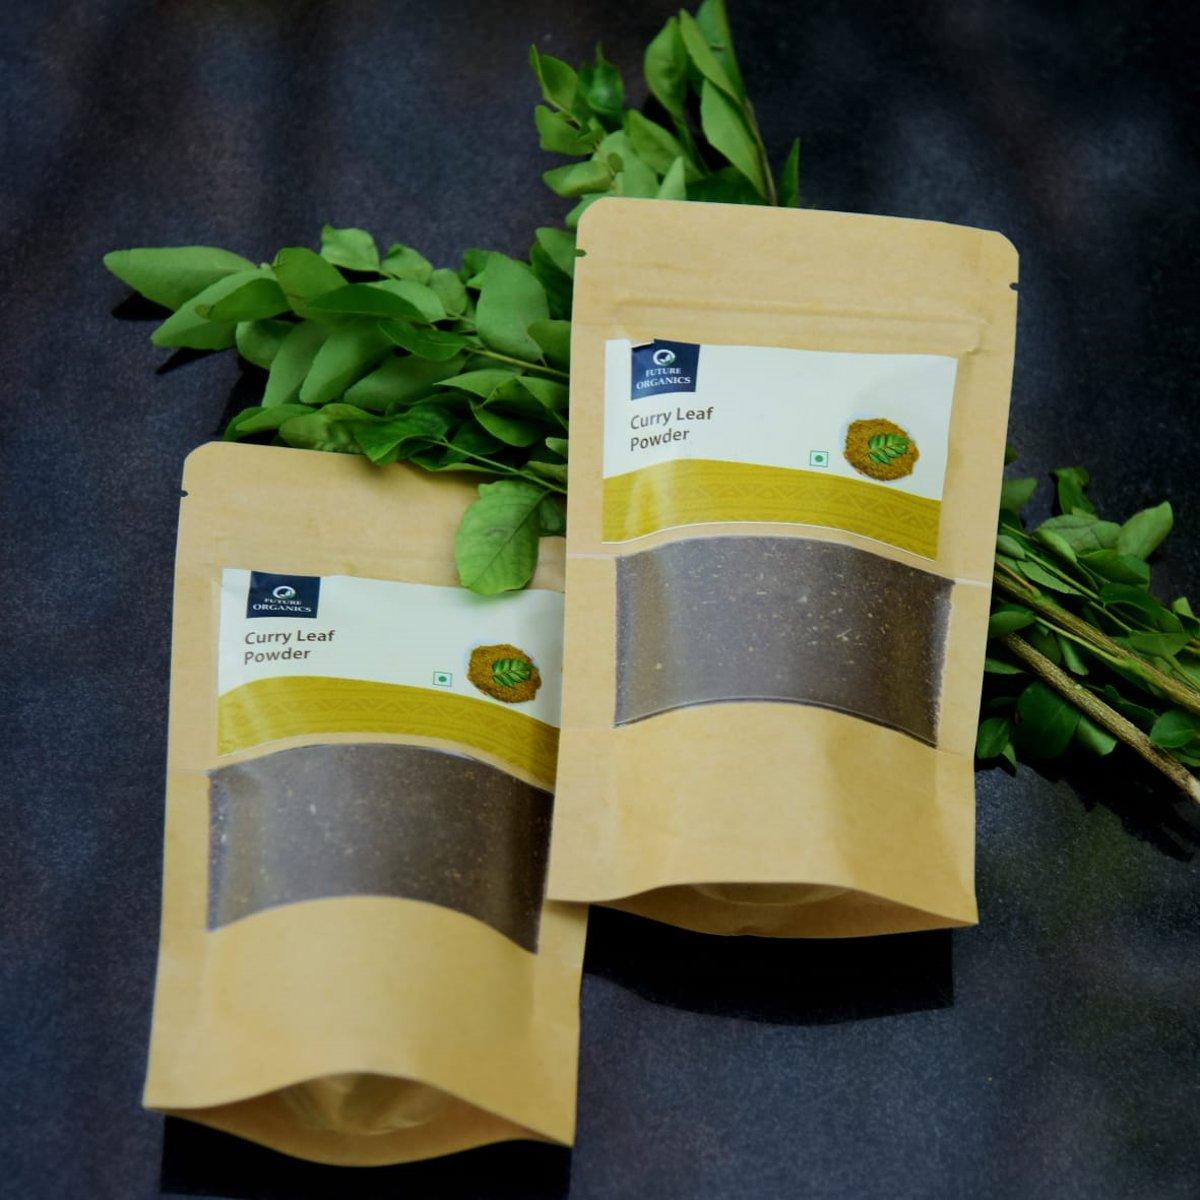 Karivepaku Podi Or Curry Leaves Powder(set of 2)